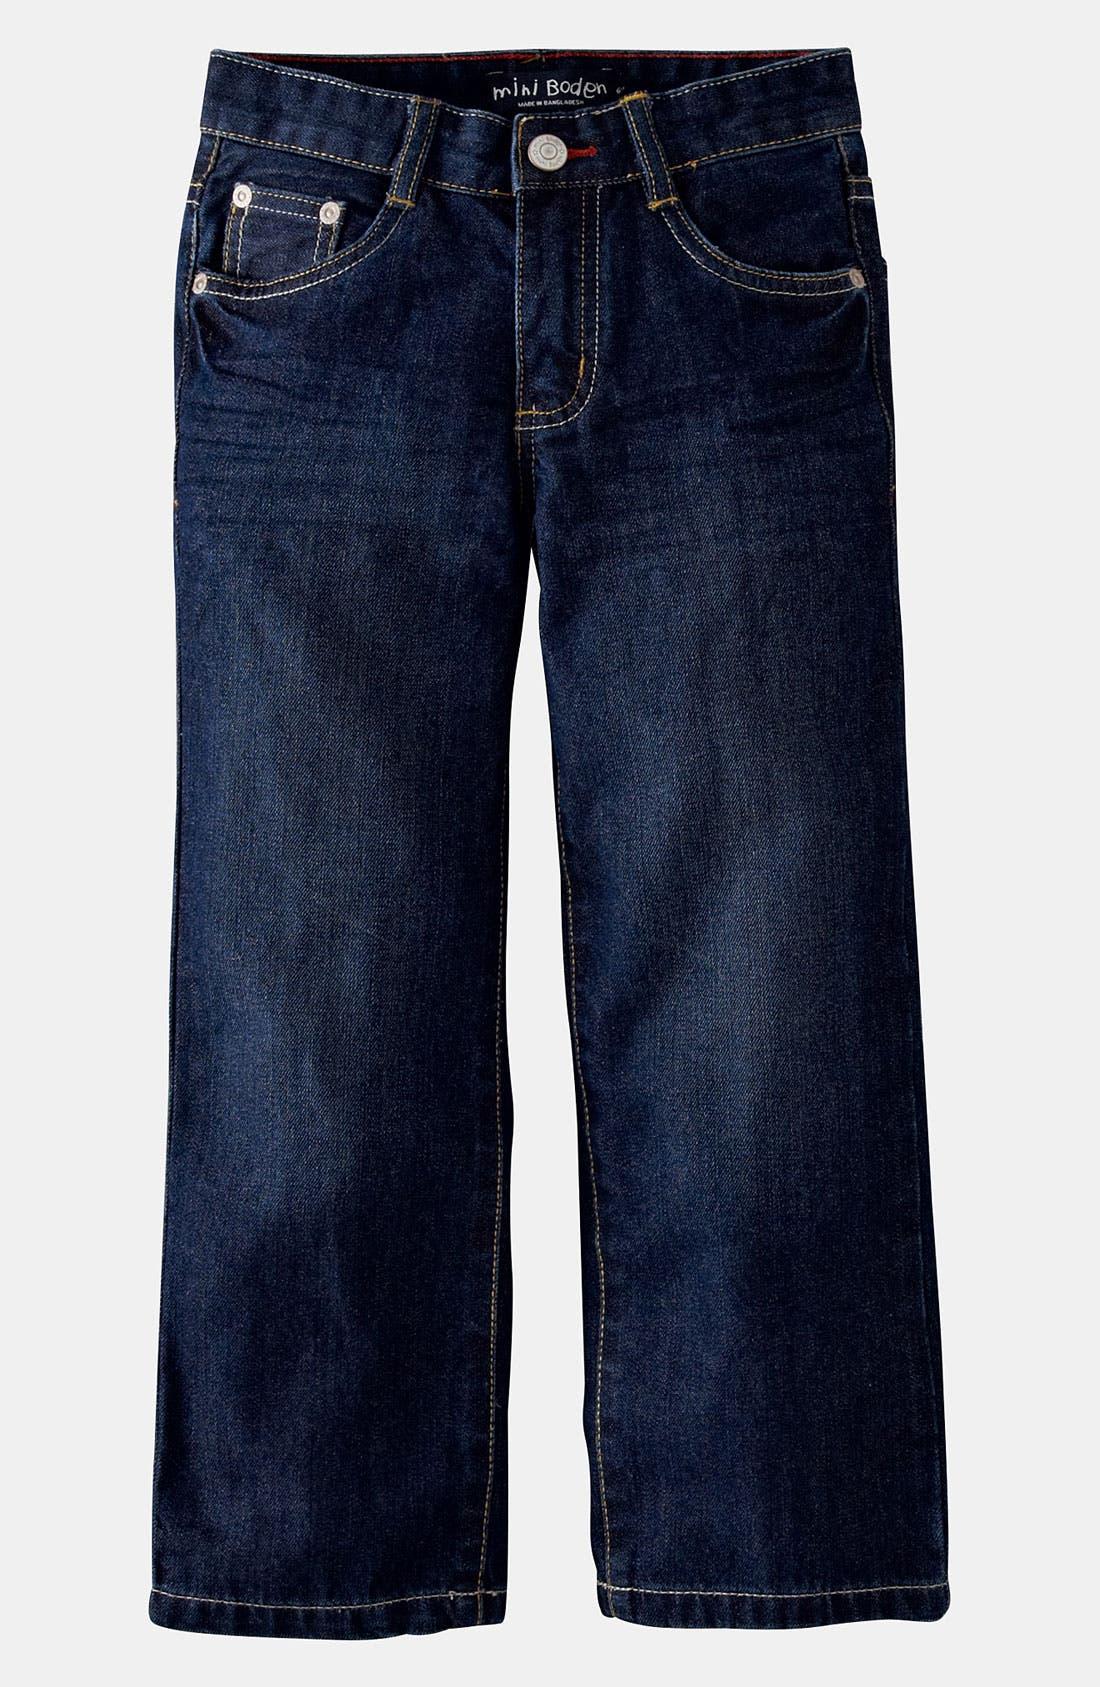 Main Image - Mini Boden Regular Fit Jeans (Toddler)